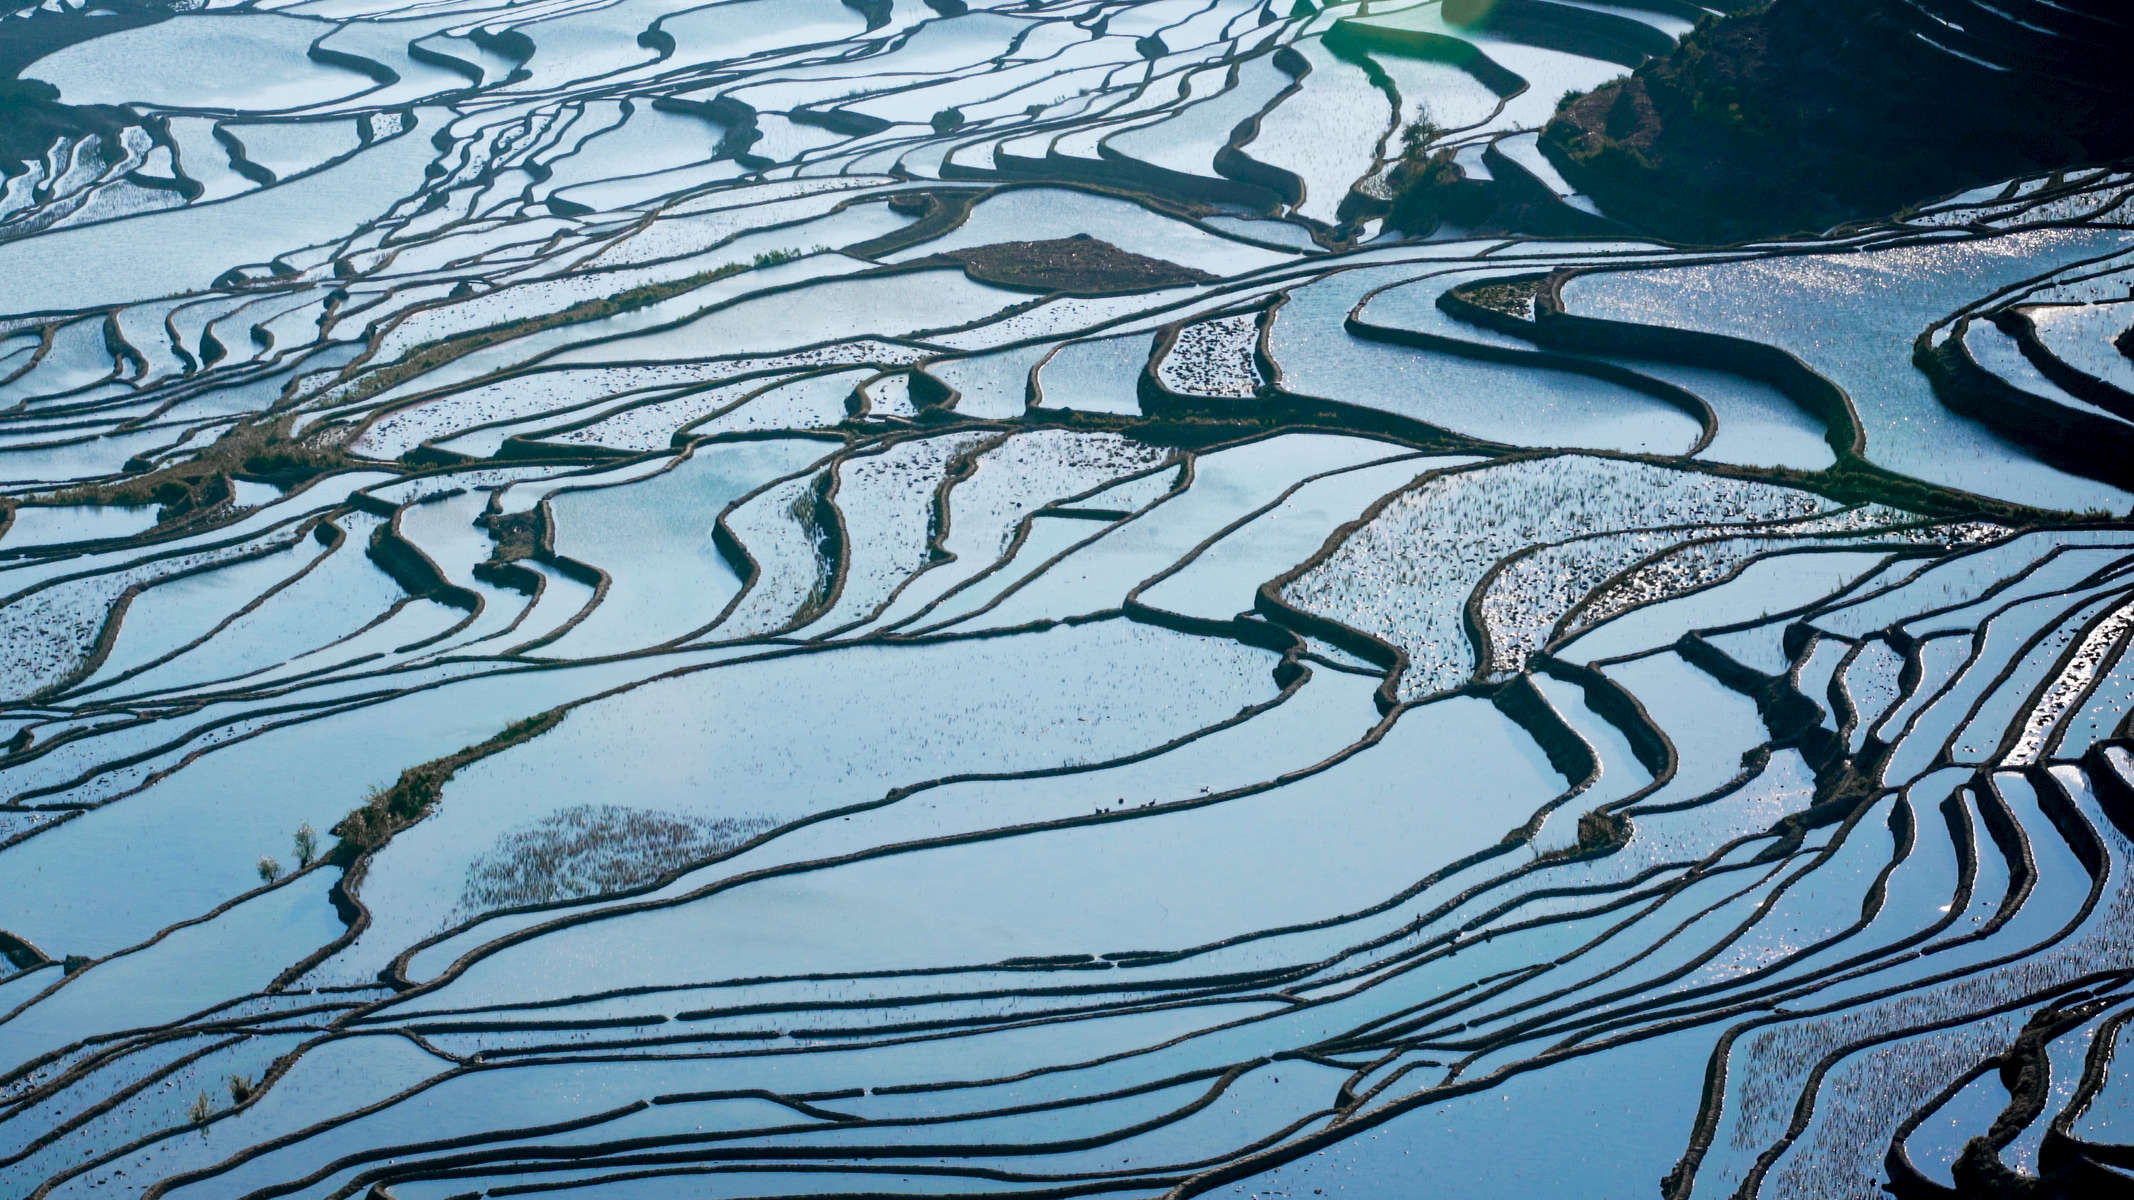 China-Yunnan-Hani-Rice-Terraces-Photo-by-Cyril-Eberle-A7S-Still-002